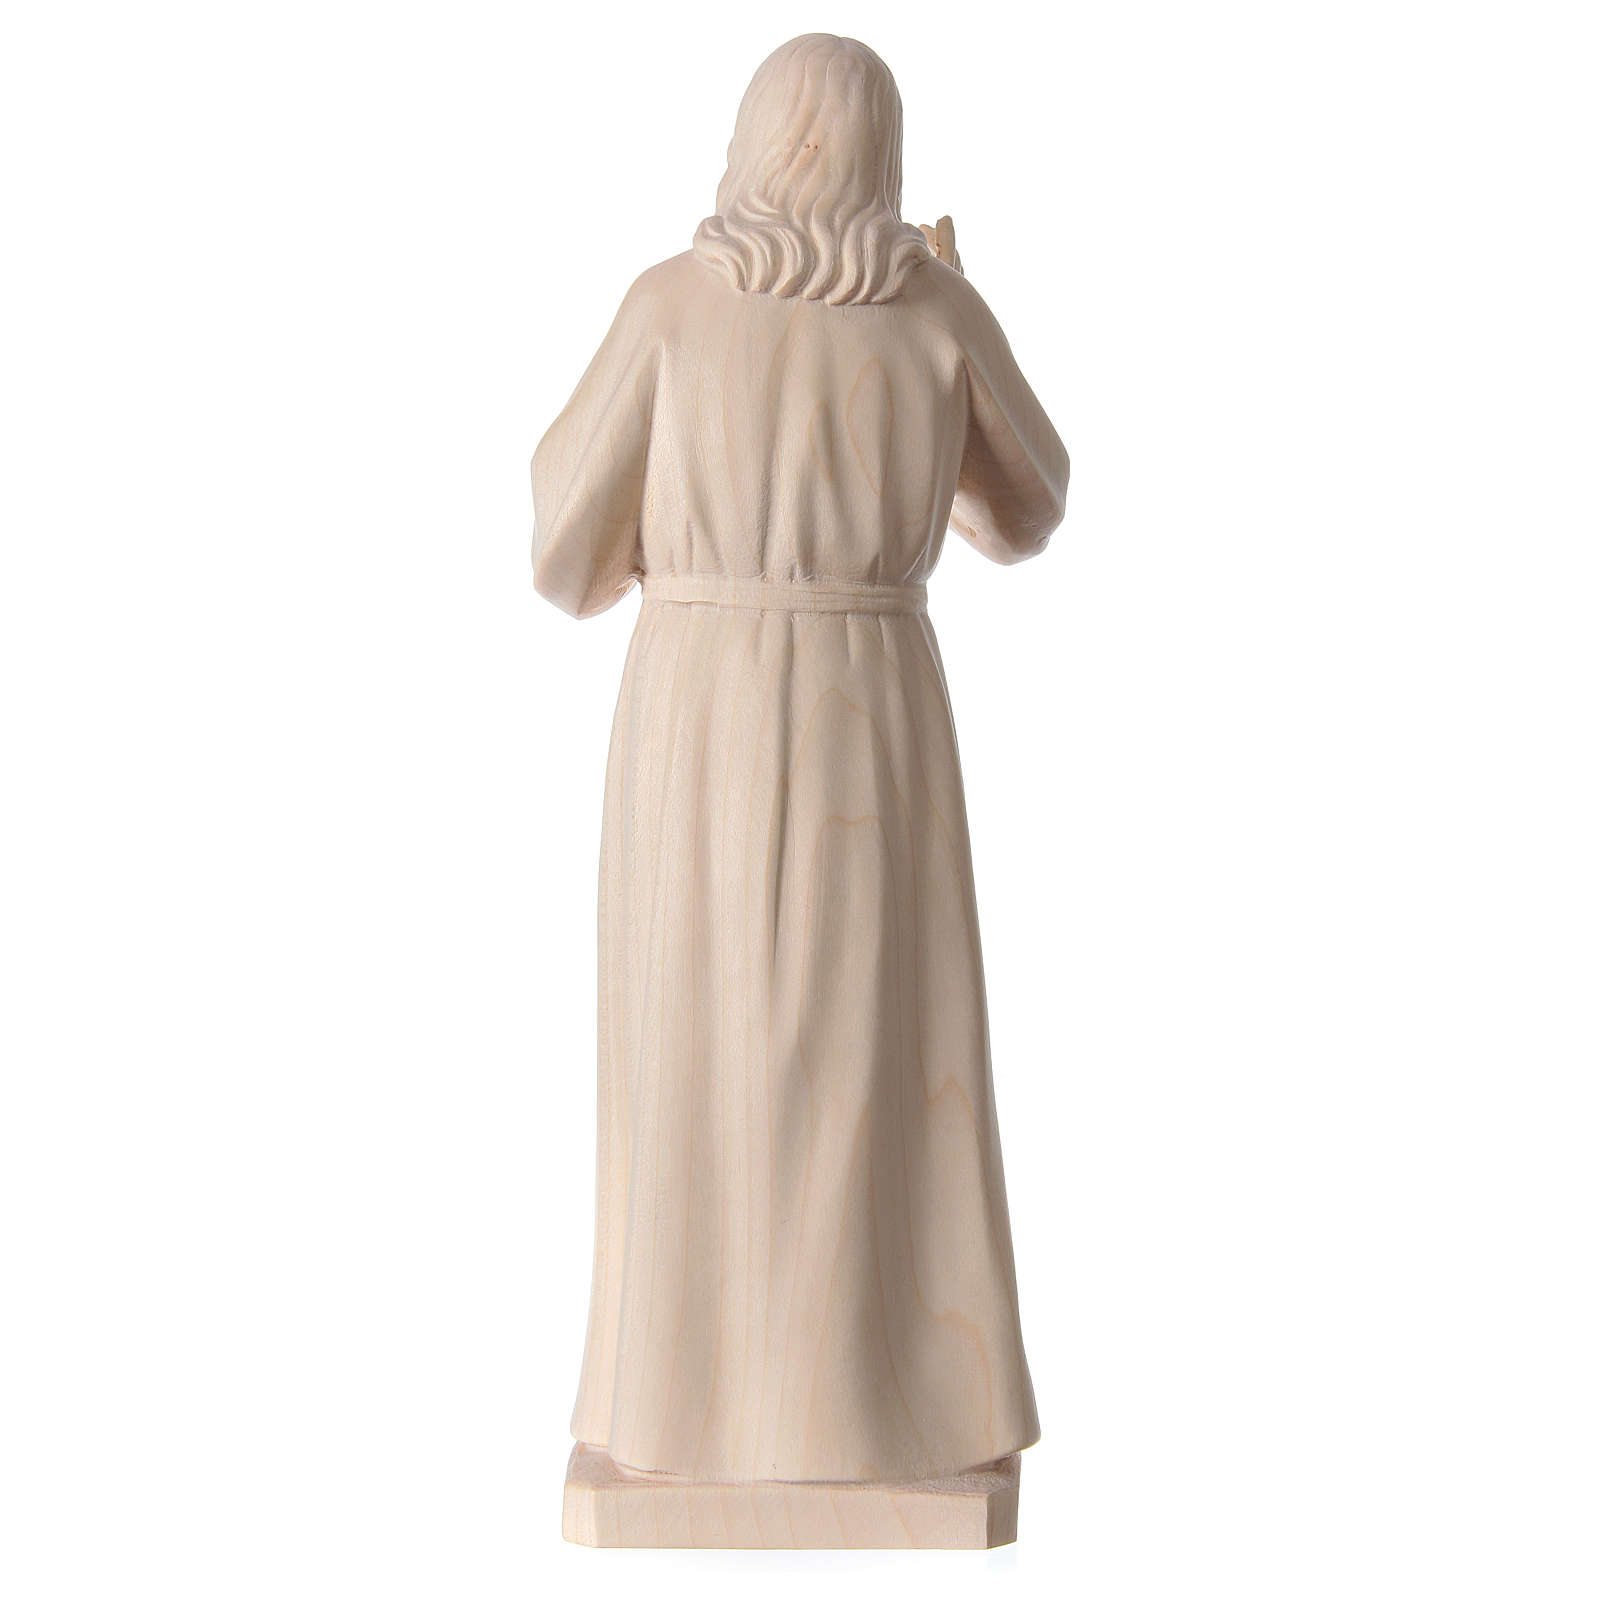 Statue natural wood Val Gardena Sacred Heart of Jesus 4